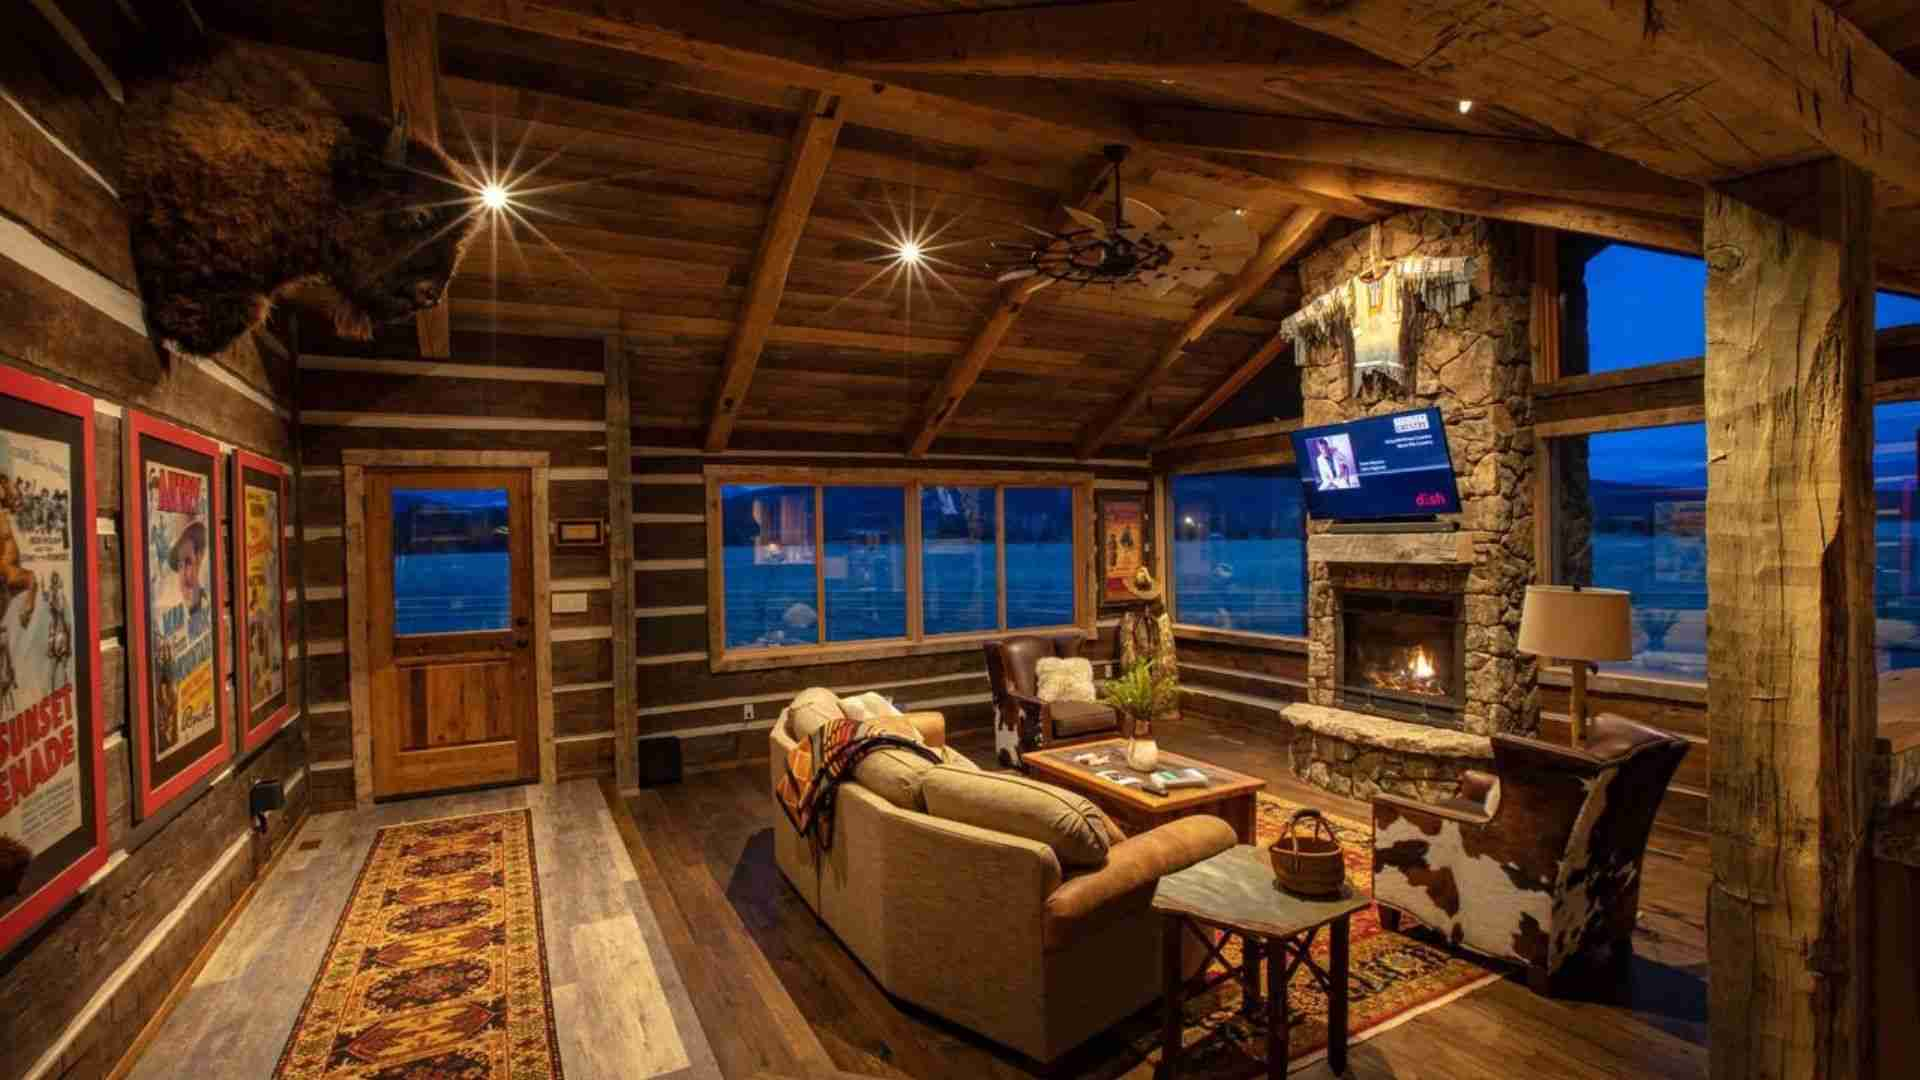 Luxury Homestead Cowboy Cabin On 10 Acres